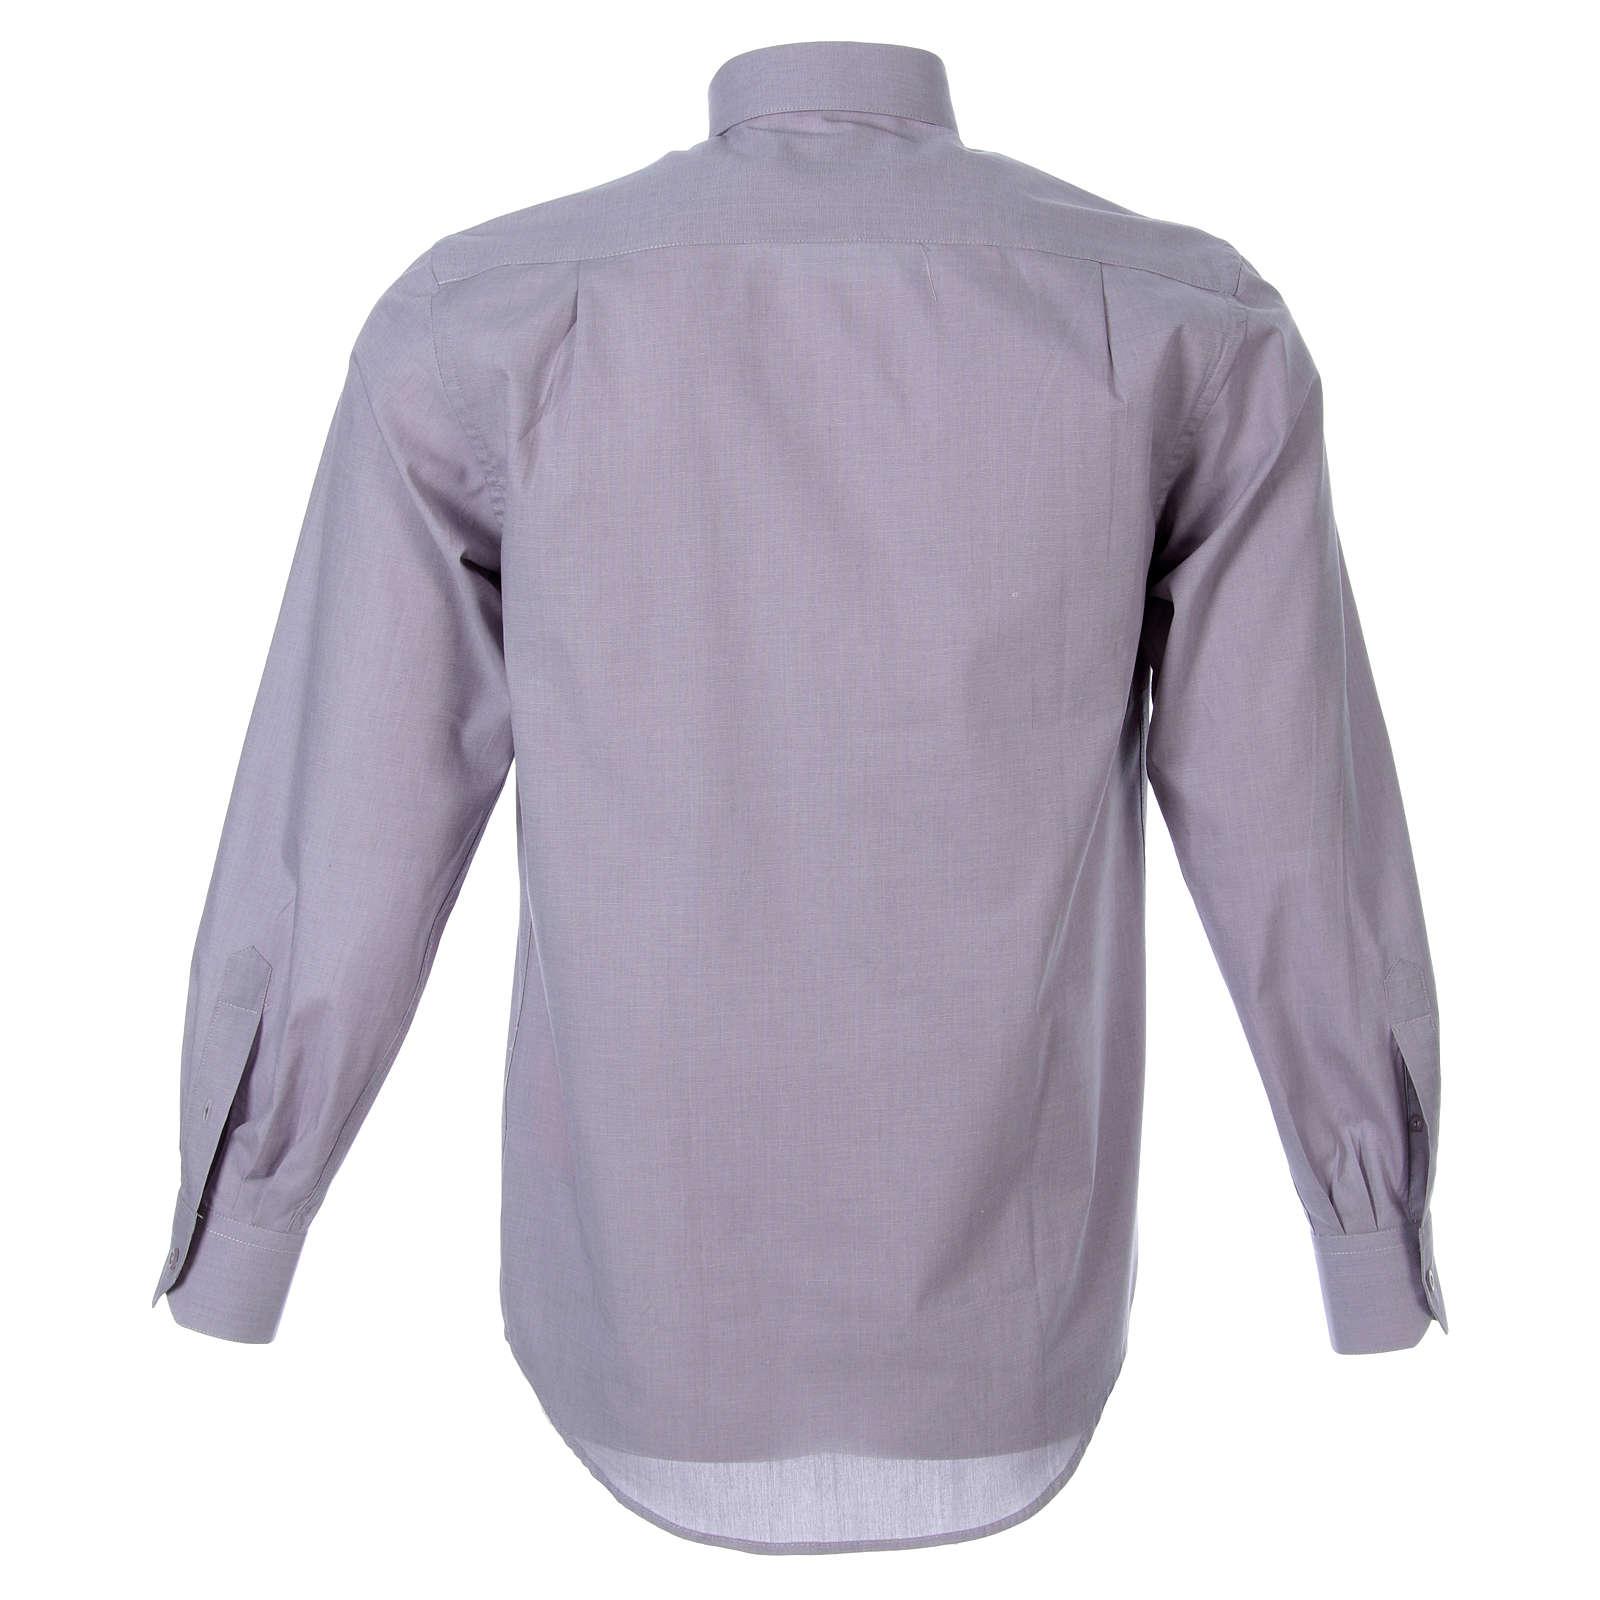 STOCK Clergyman shirt in light grey fil a fil cotton, long sleeves 4